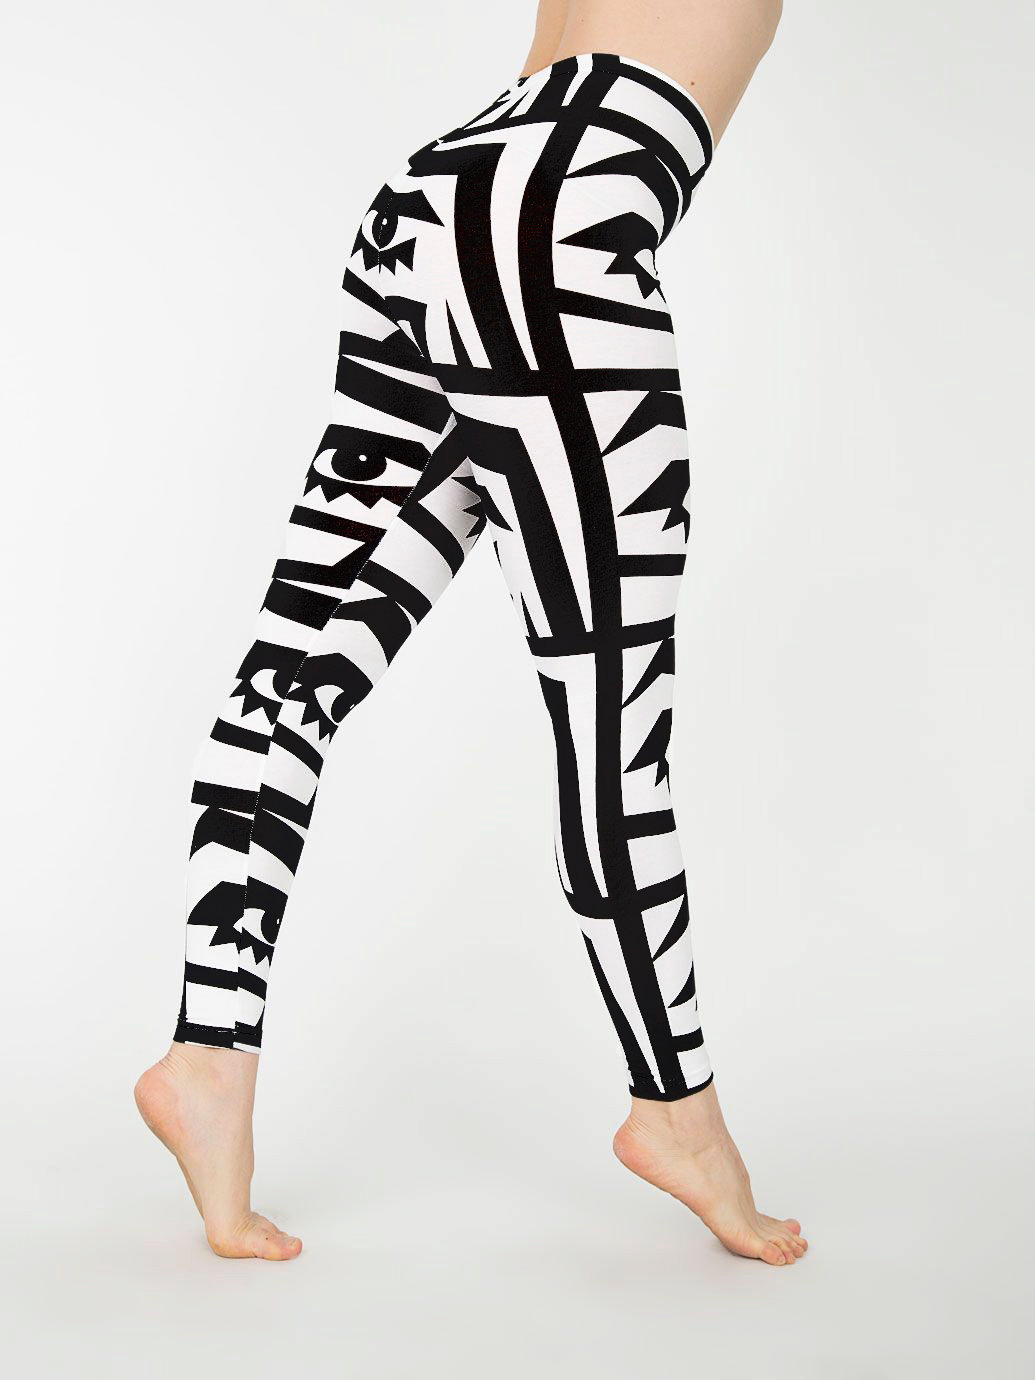 KESH X American Apparel Cotton Spandex Legging | American Apparel